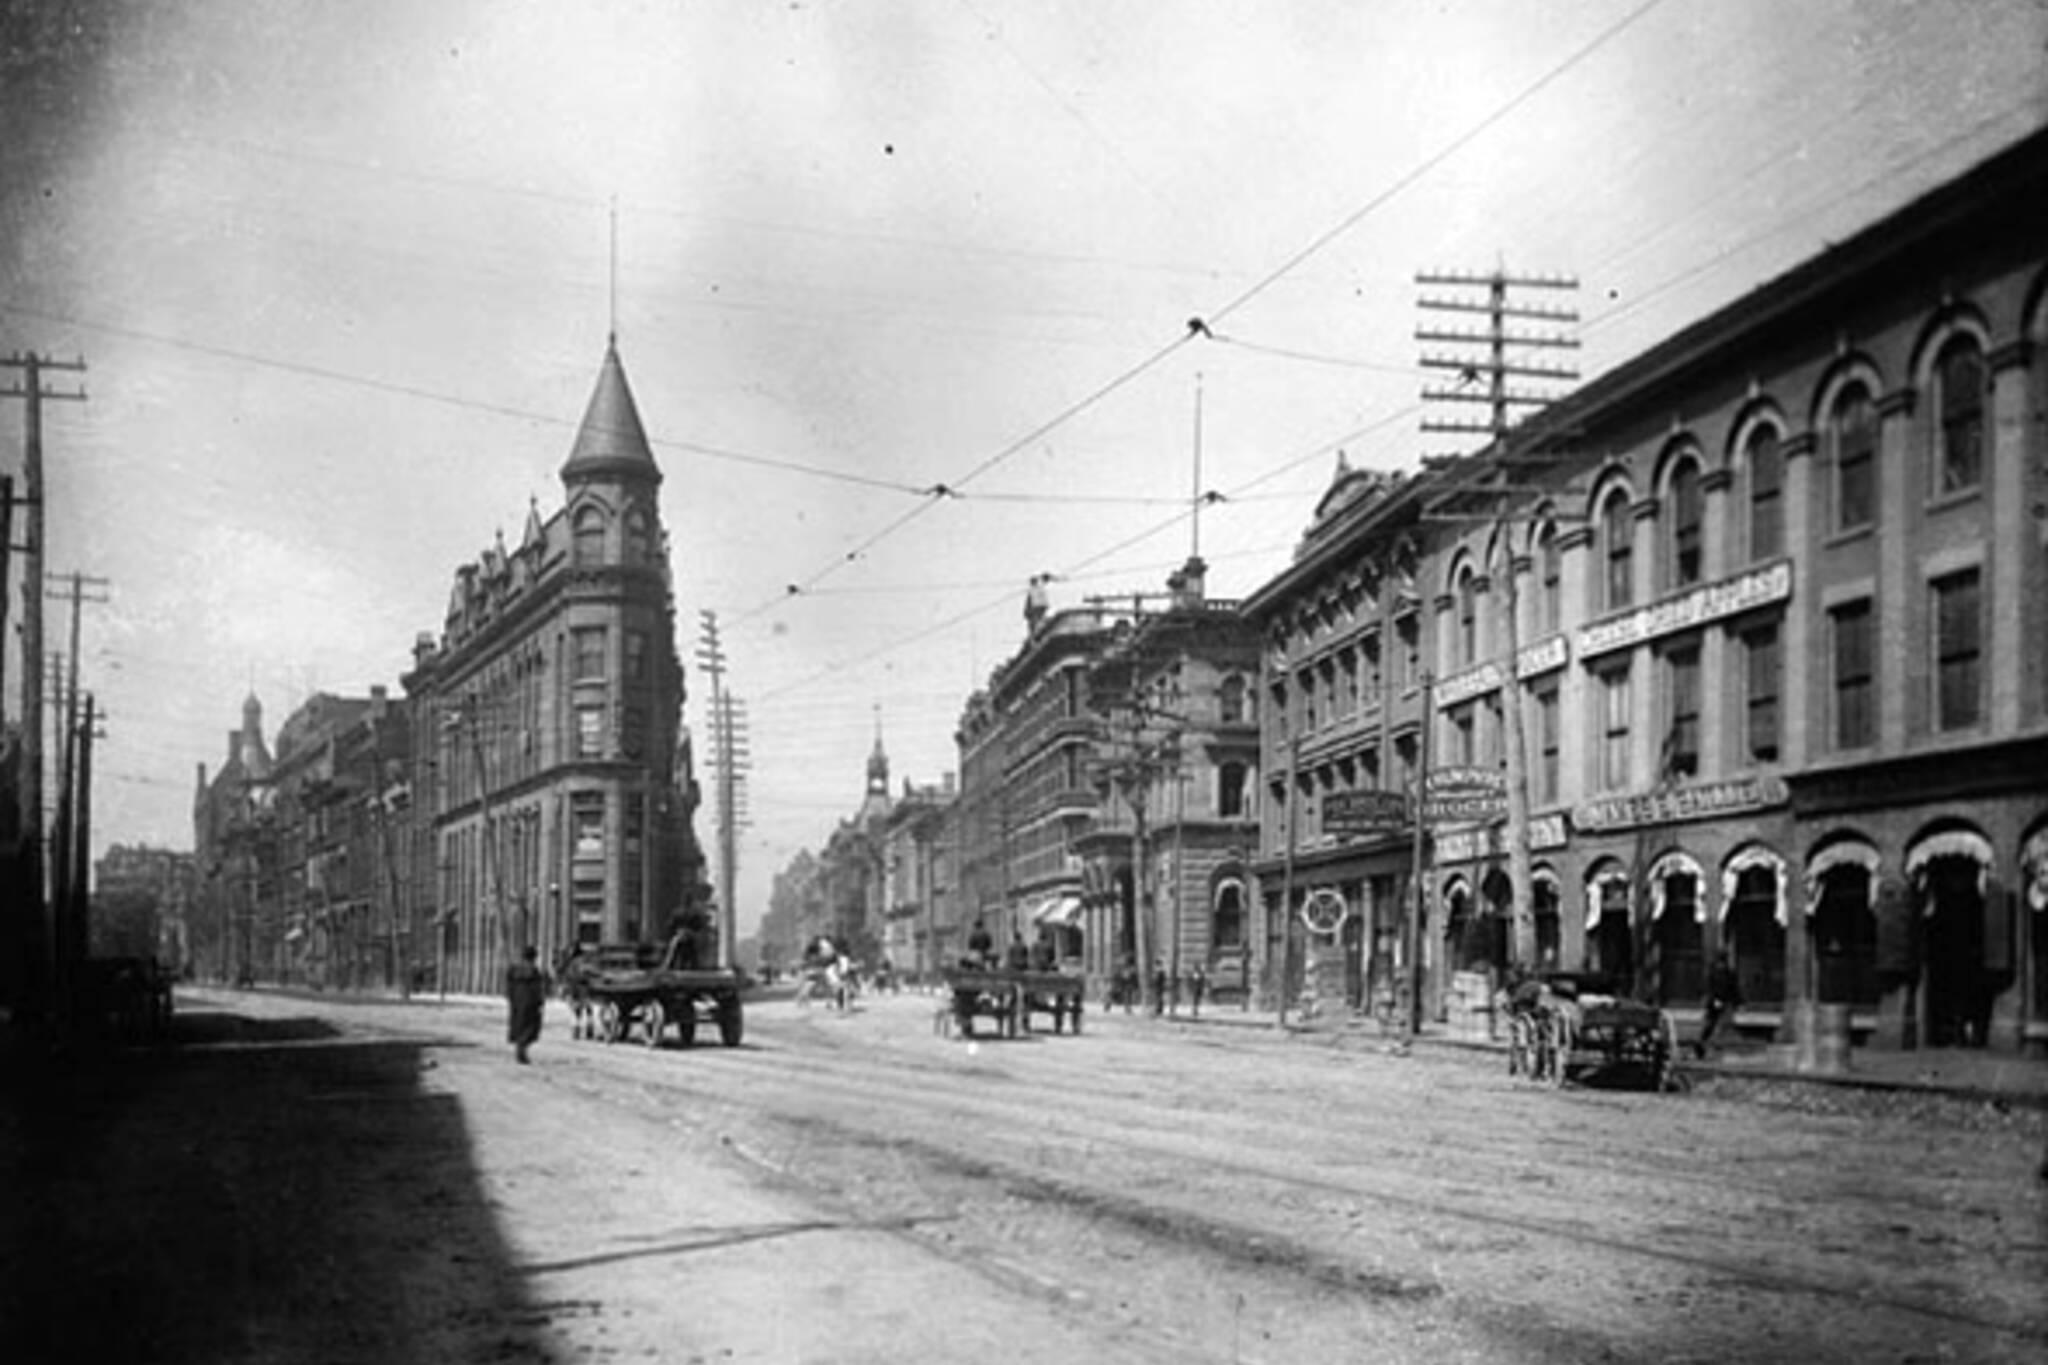 Toronto, Flatiron, Gooderham Building, George Gooderham, Romanesque Revival, David Roberts Jr.